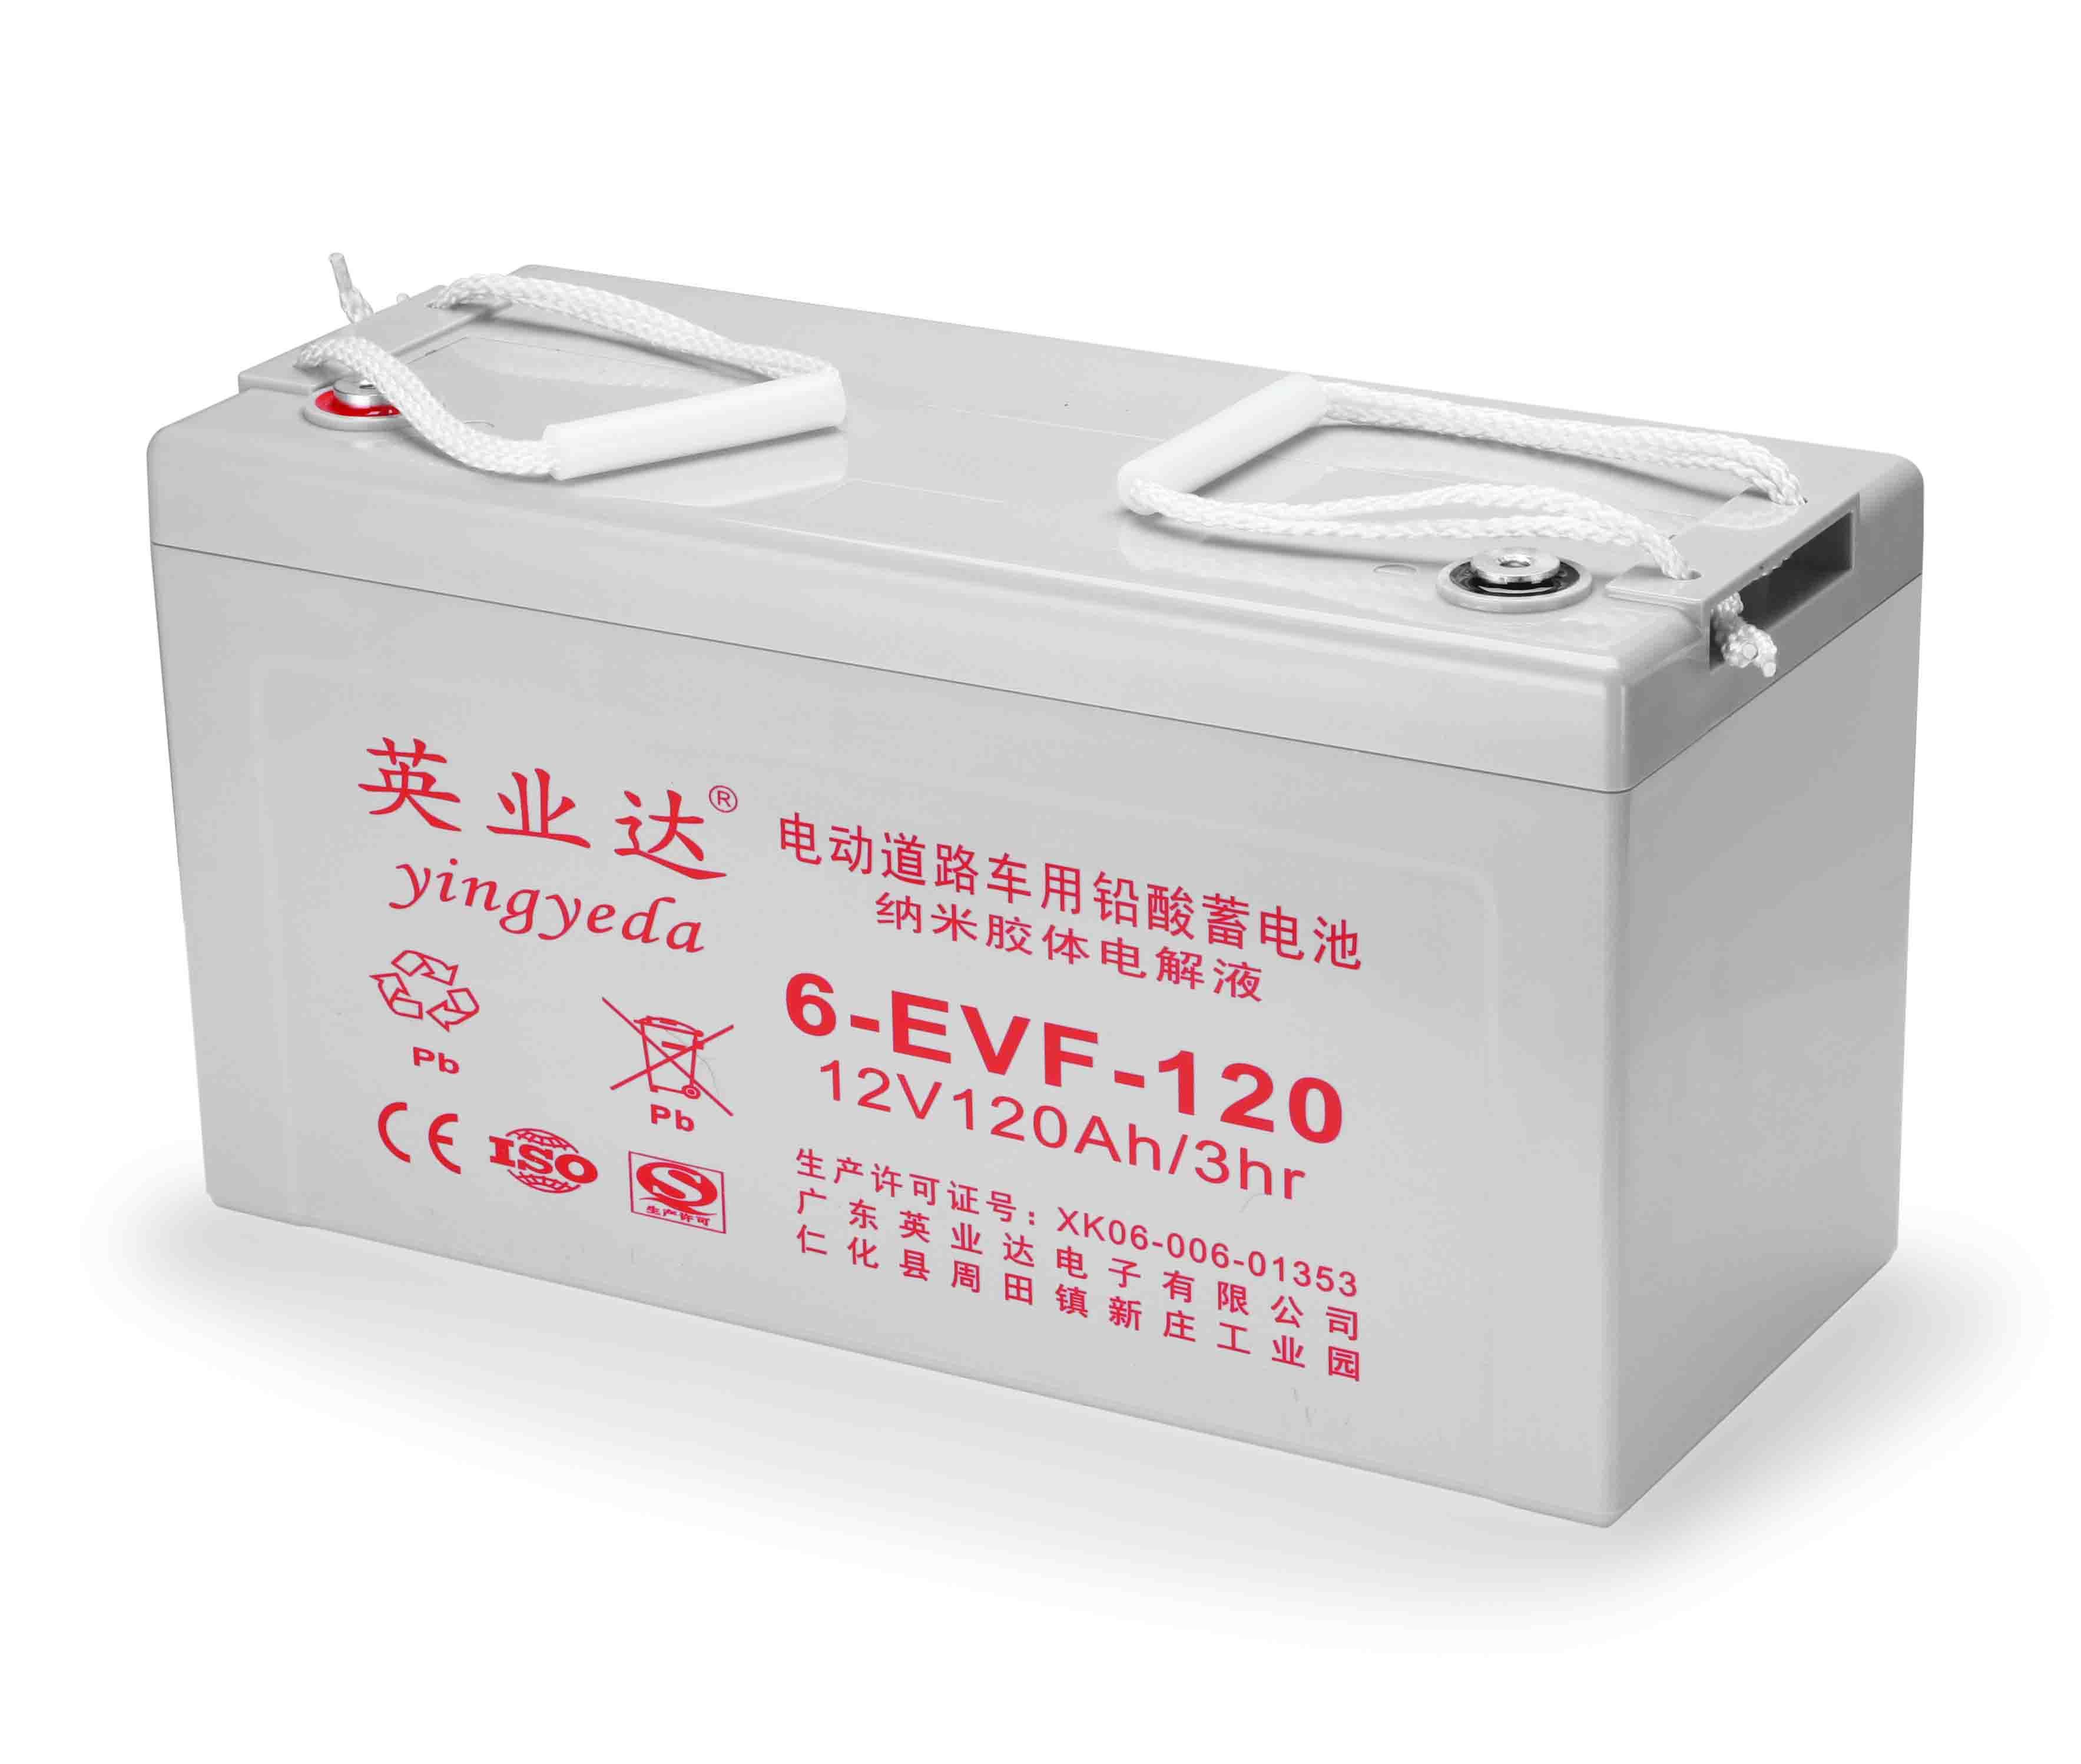 英业达蓄电池6-EVF-120